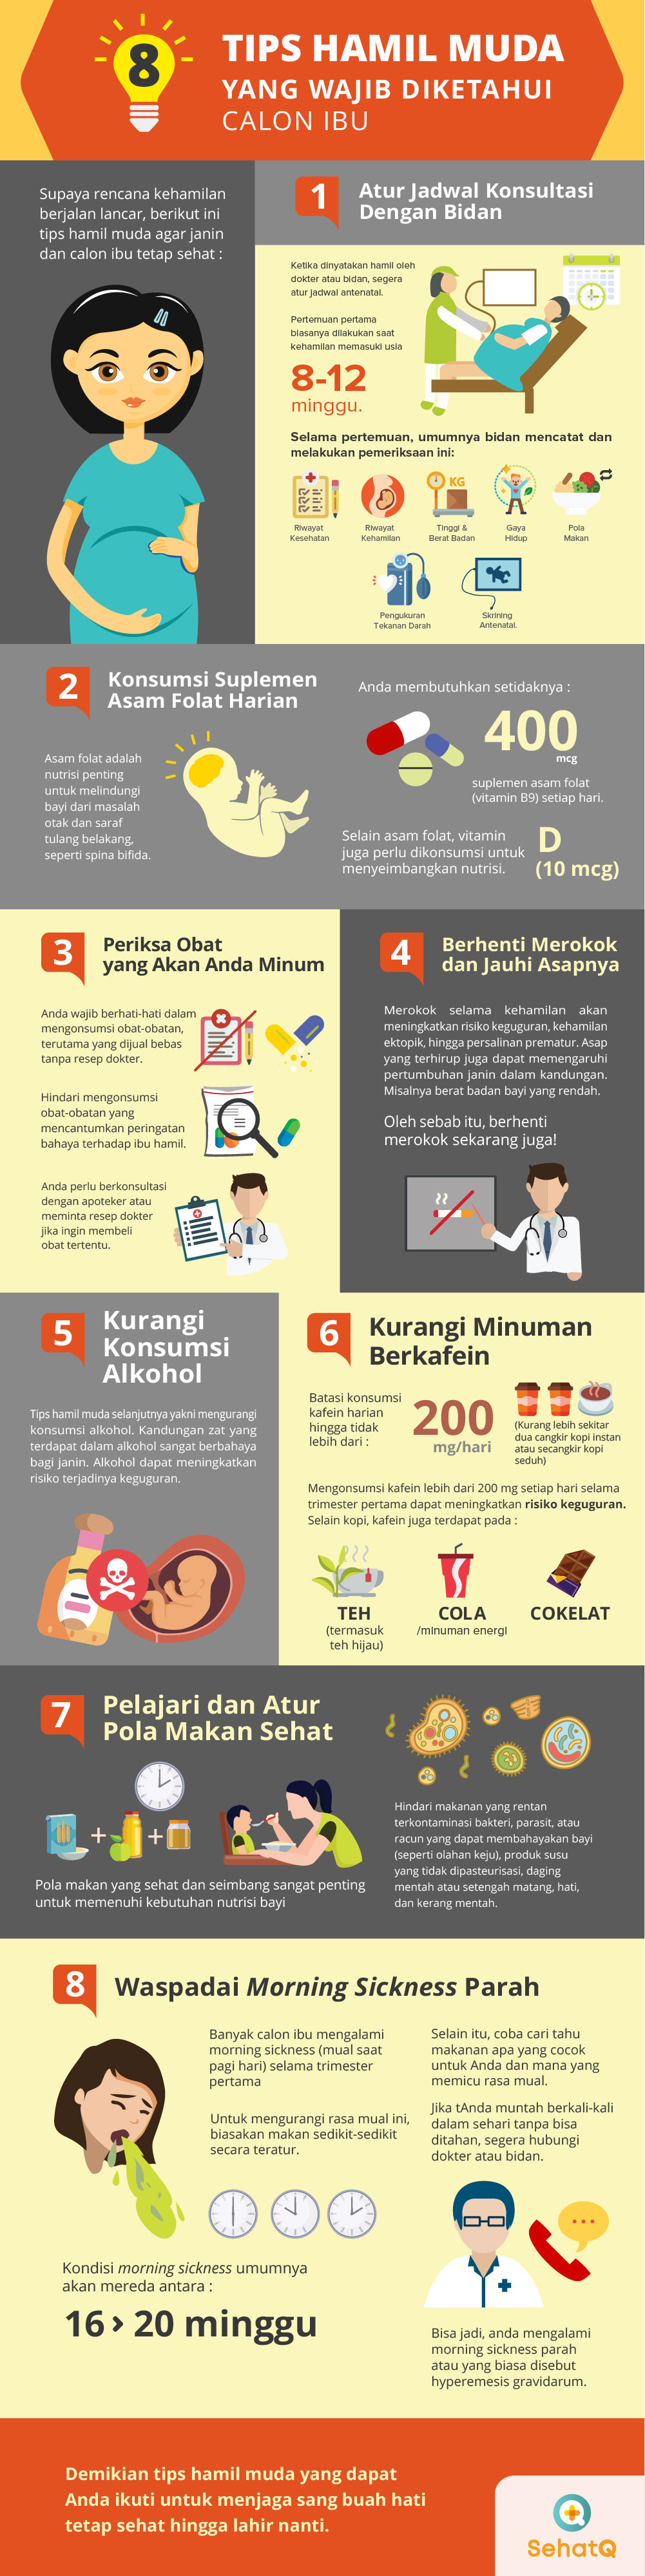 tips hamil muda